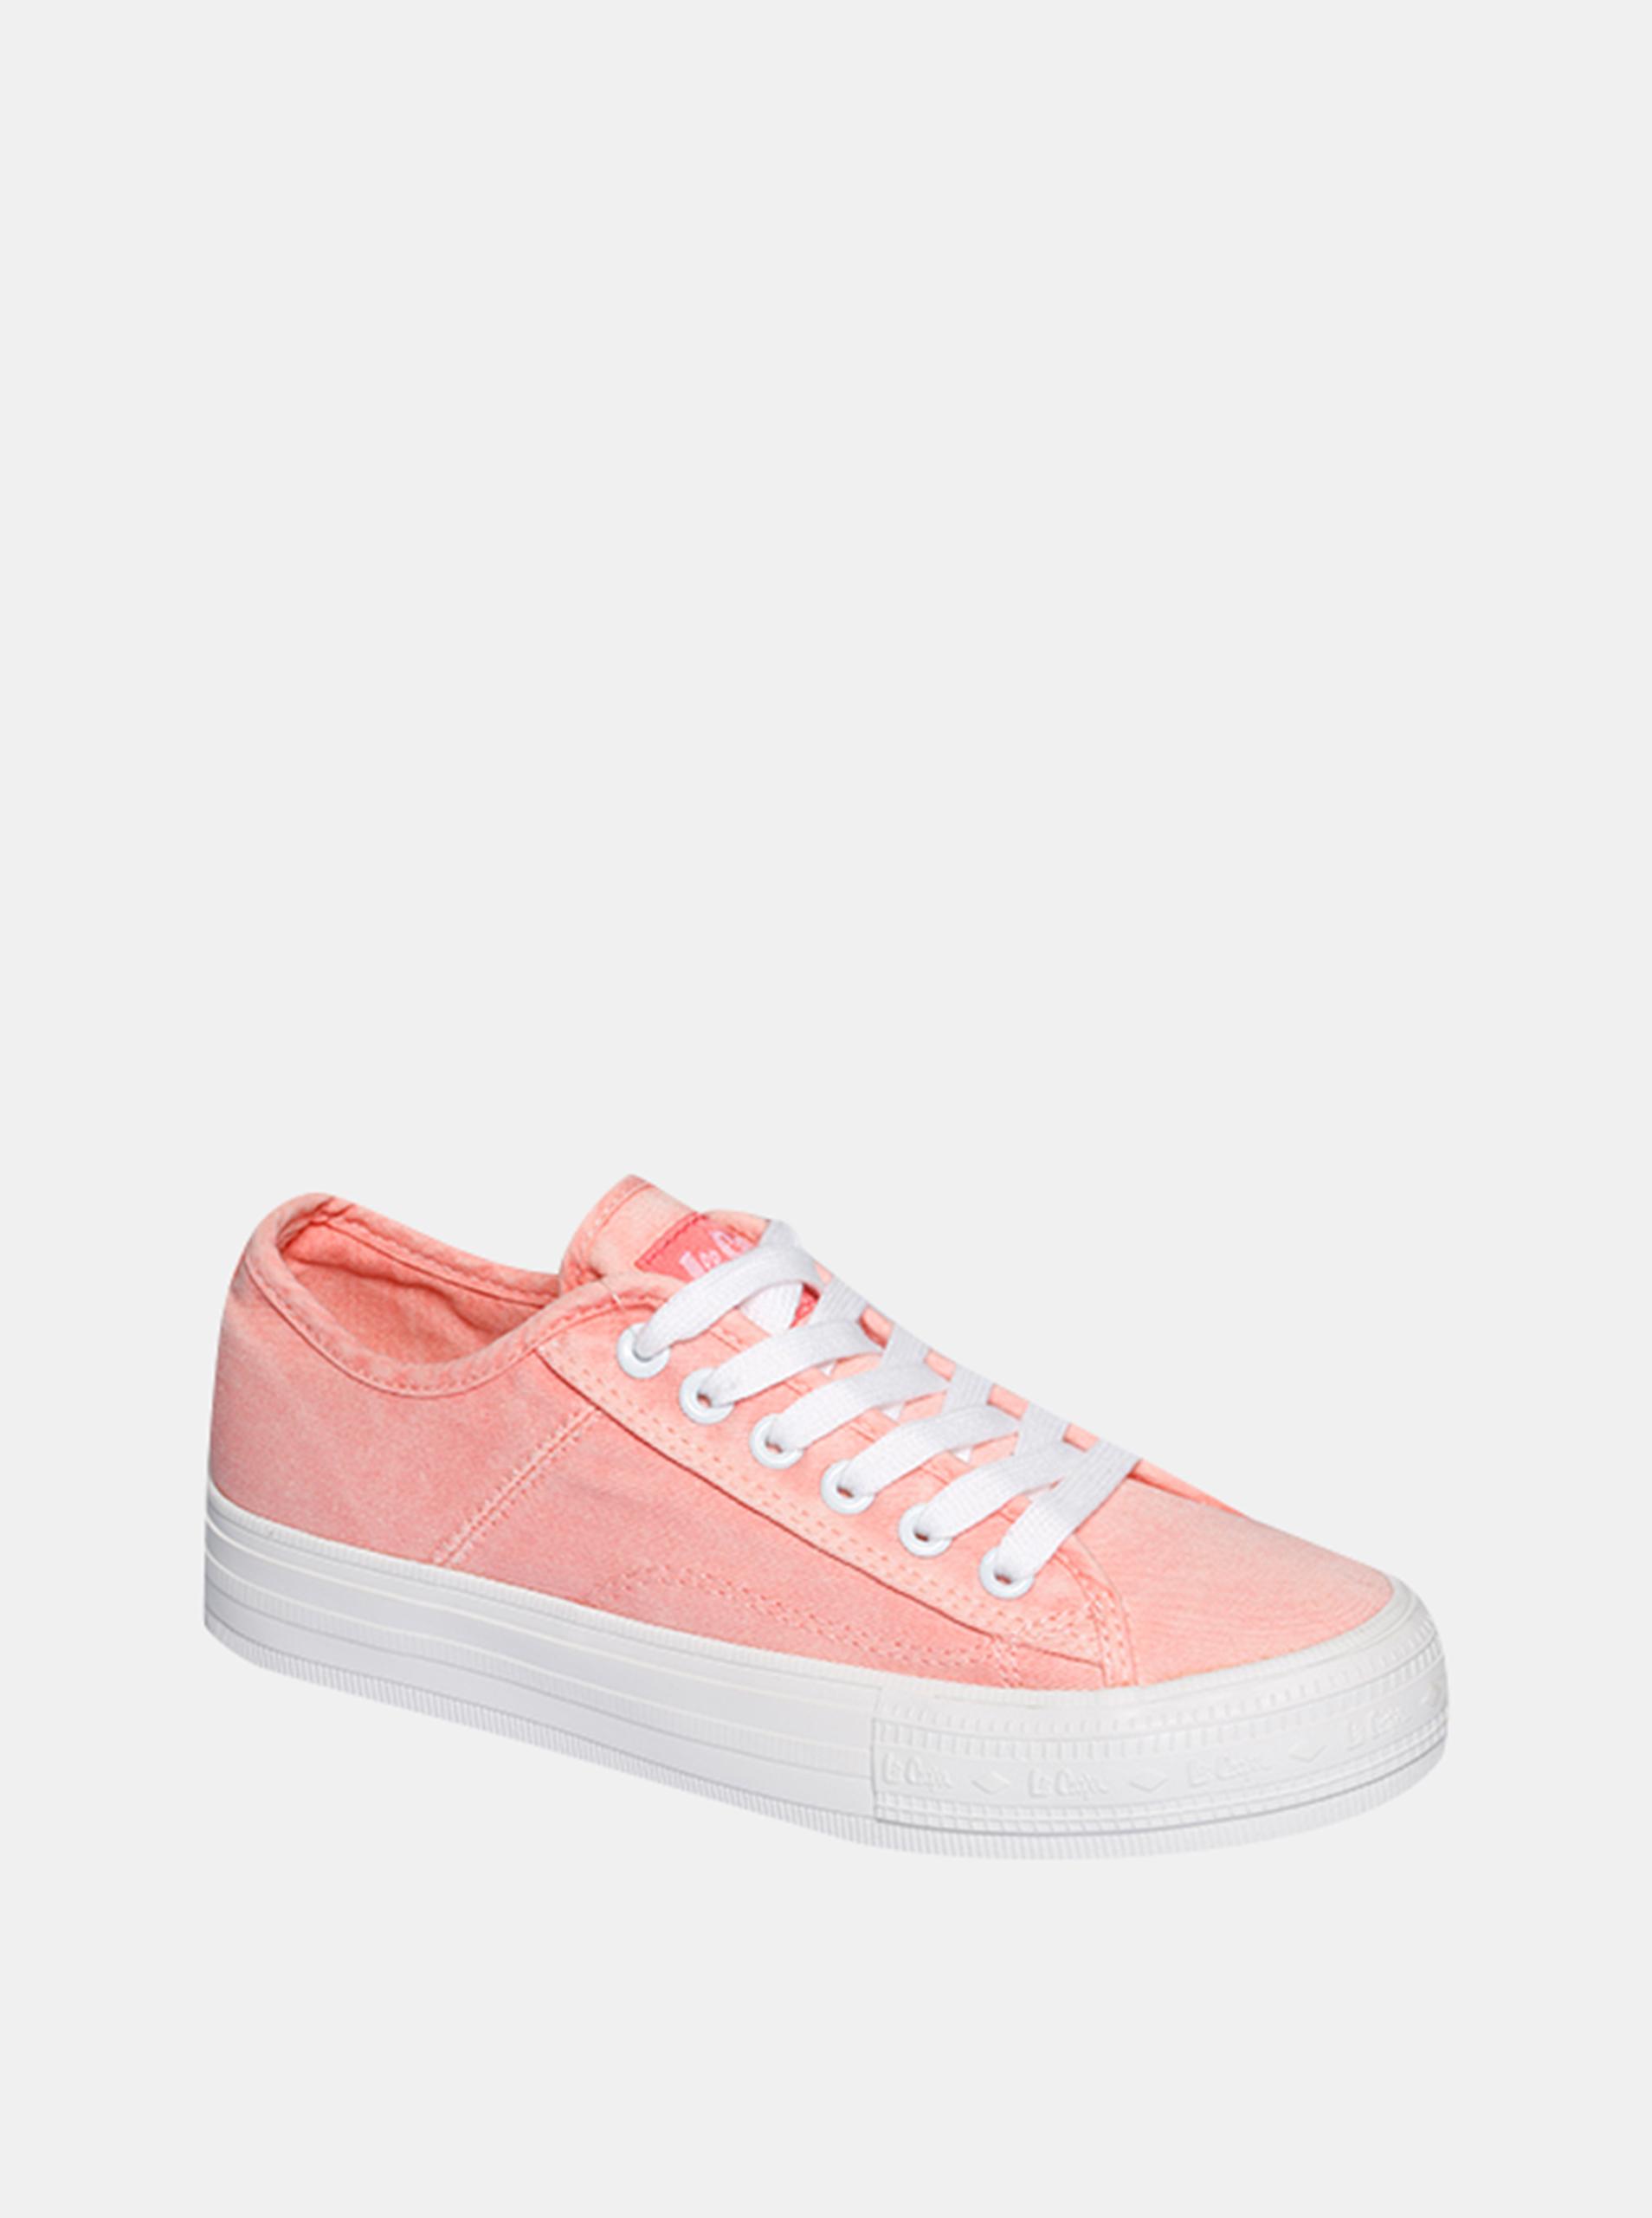 Ružové dámske tenisky Lee Cooper - 38